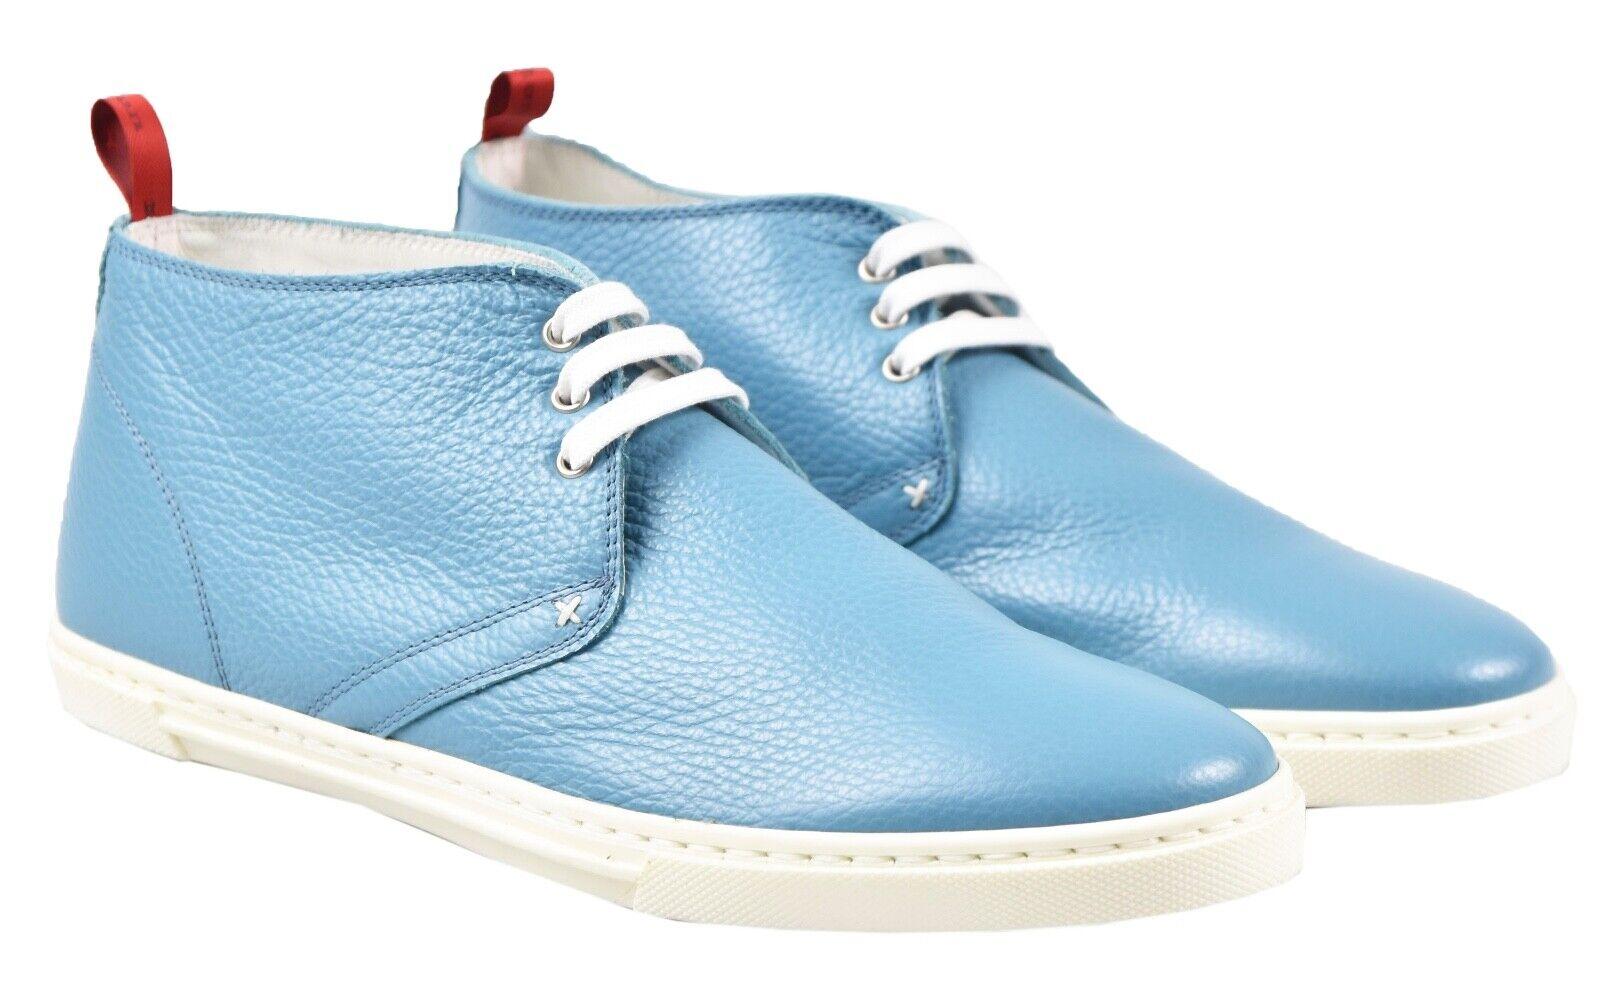 NEW KITON scarpe scarpe da ginnastica 100% LEATHER SZ 8.5 US 41.5 EU 19O124